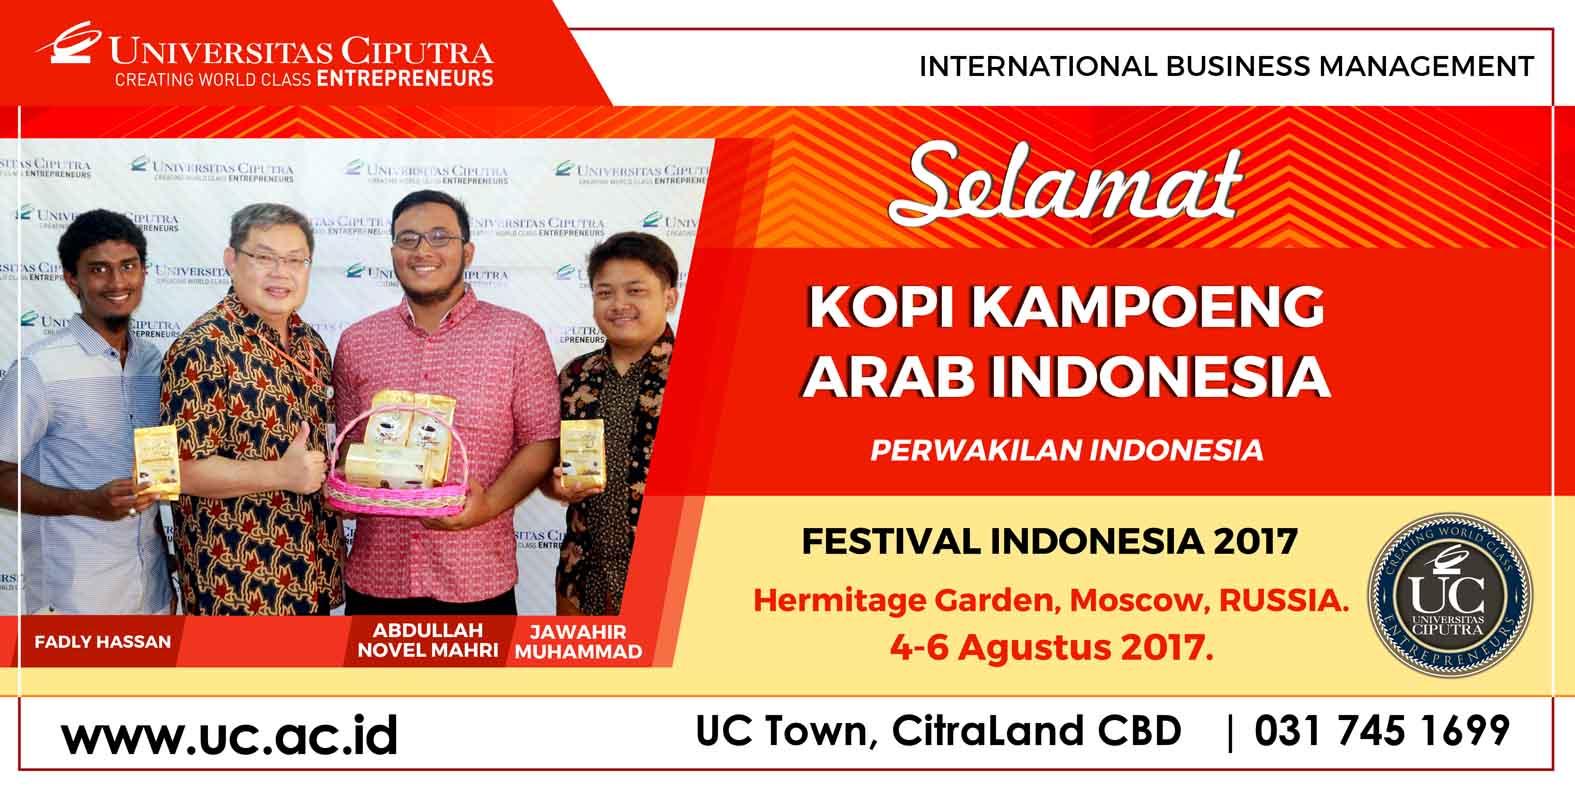 KOPI KAMPOENG ARAB INDONESIA